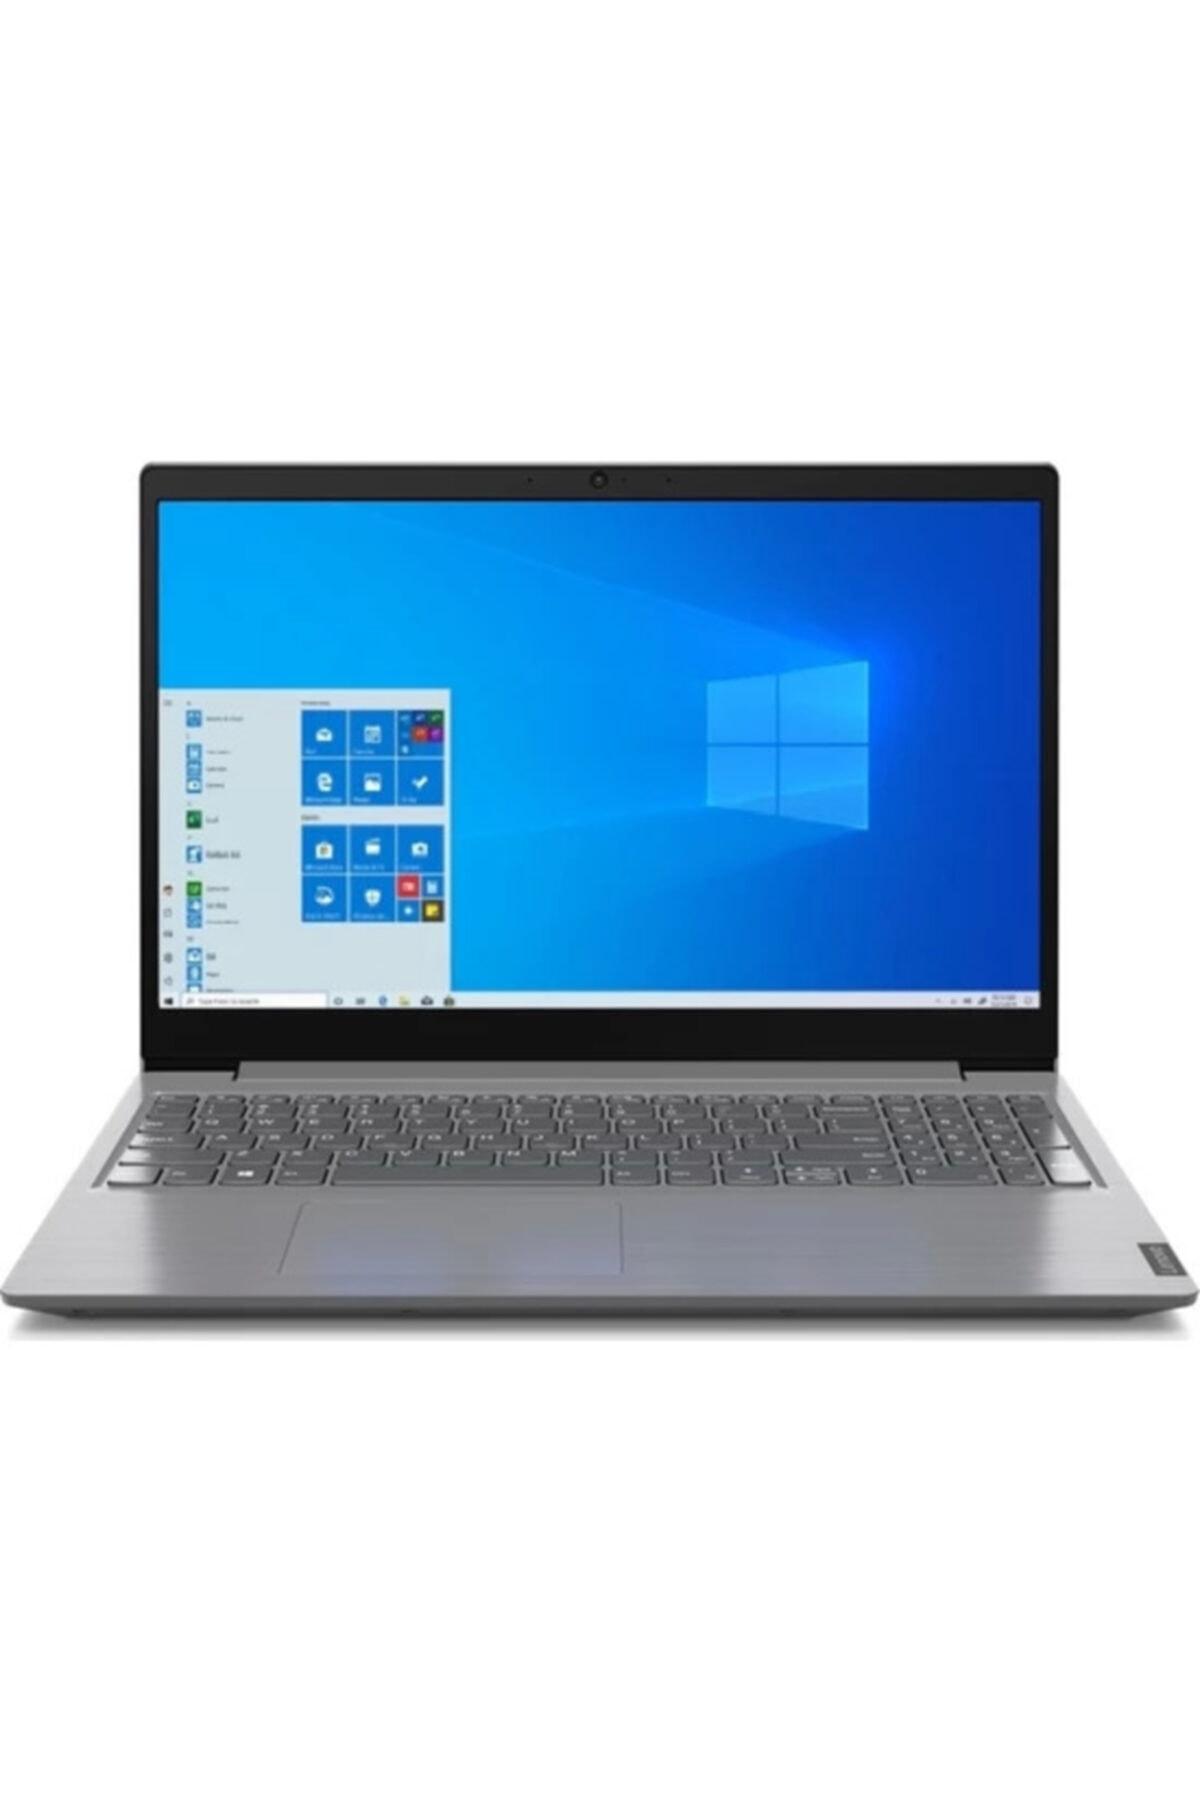 "82c500qttx I3 1005g1 8gb 256gb Ssd W10h 15.6"" Fhd + Microsoft 365 1 Yıl Dijital Bireysel"